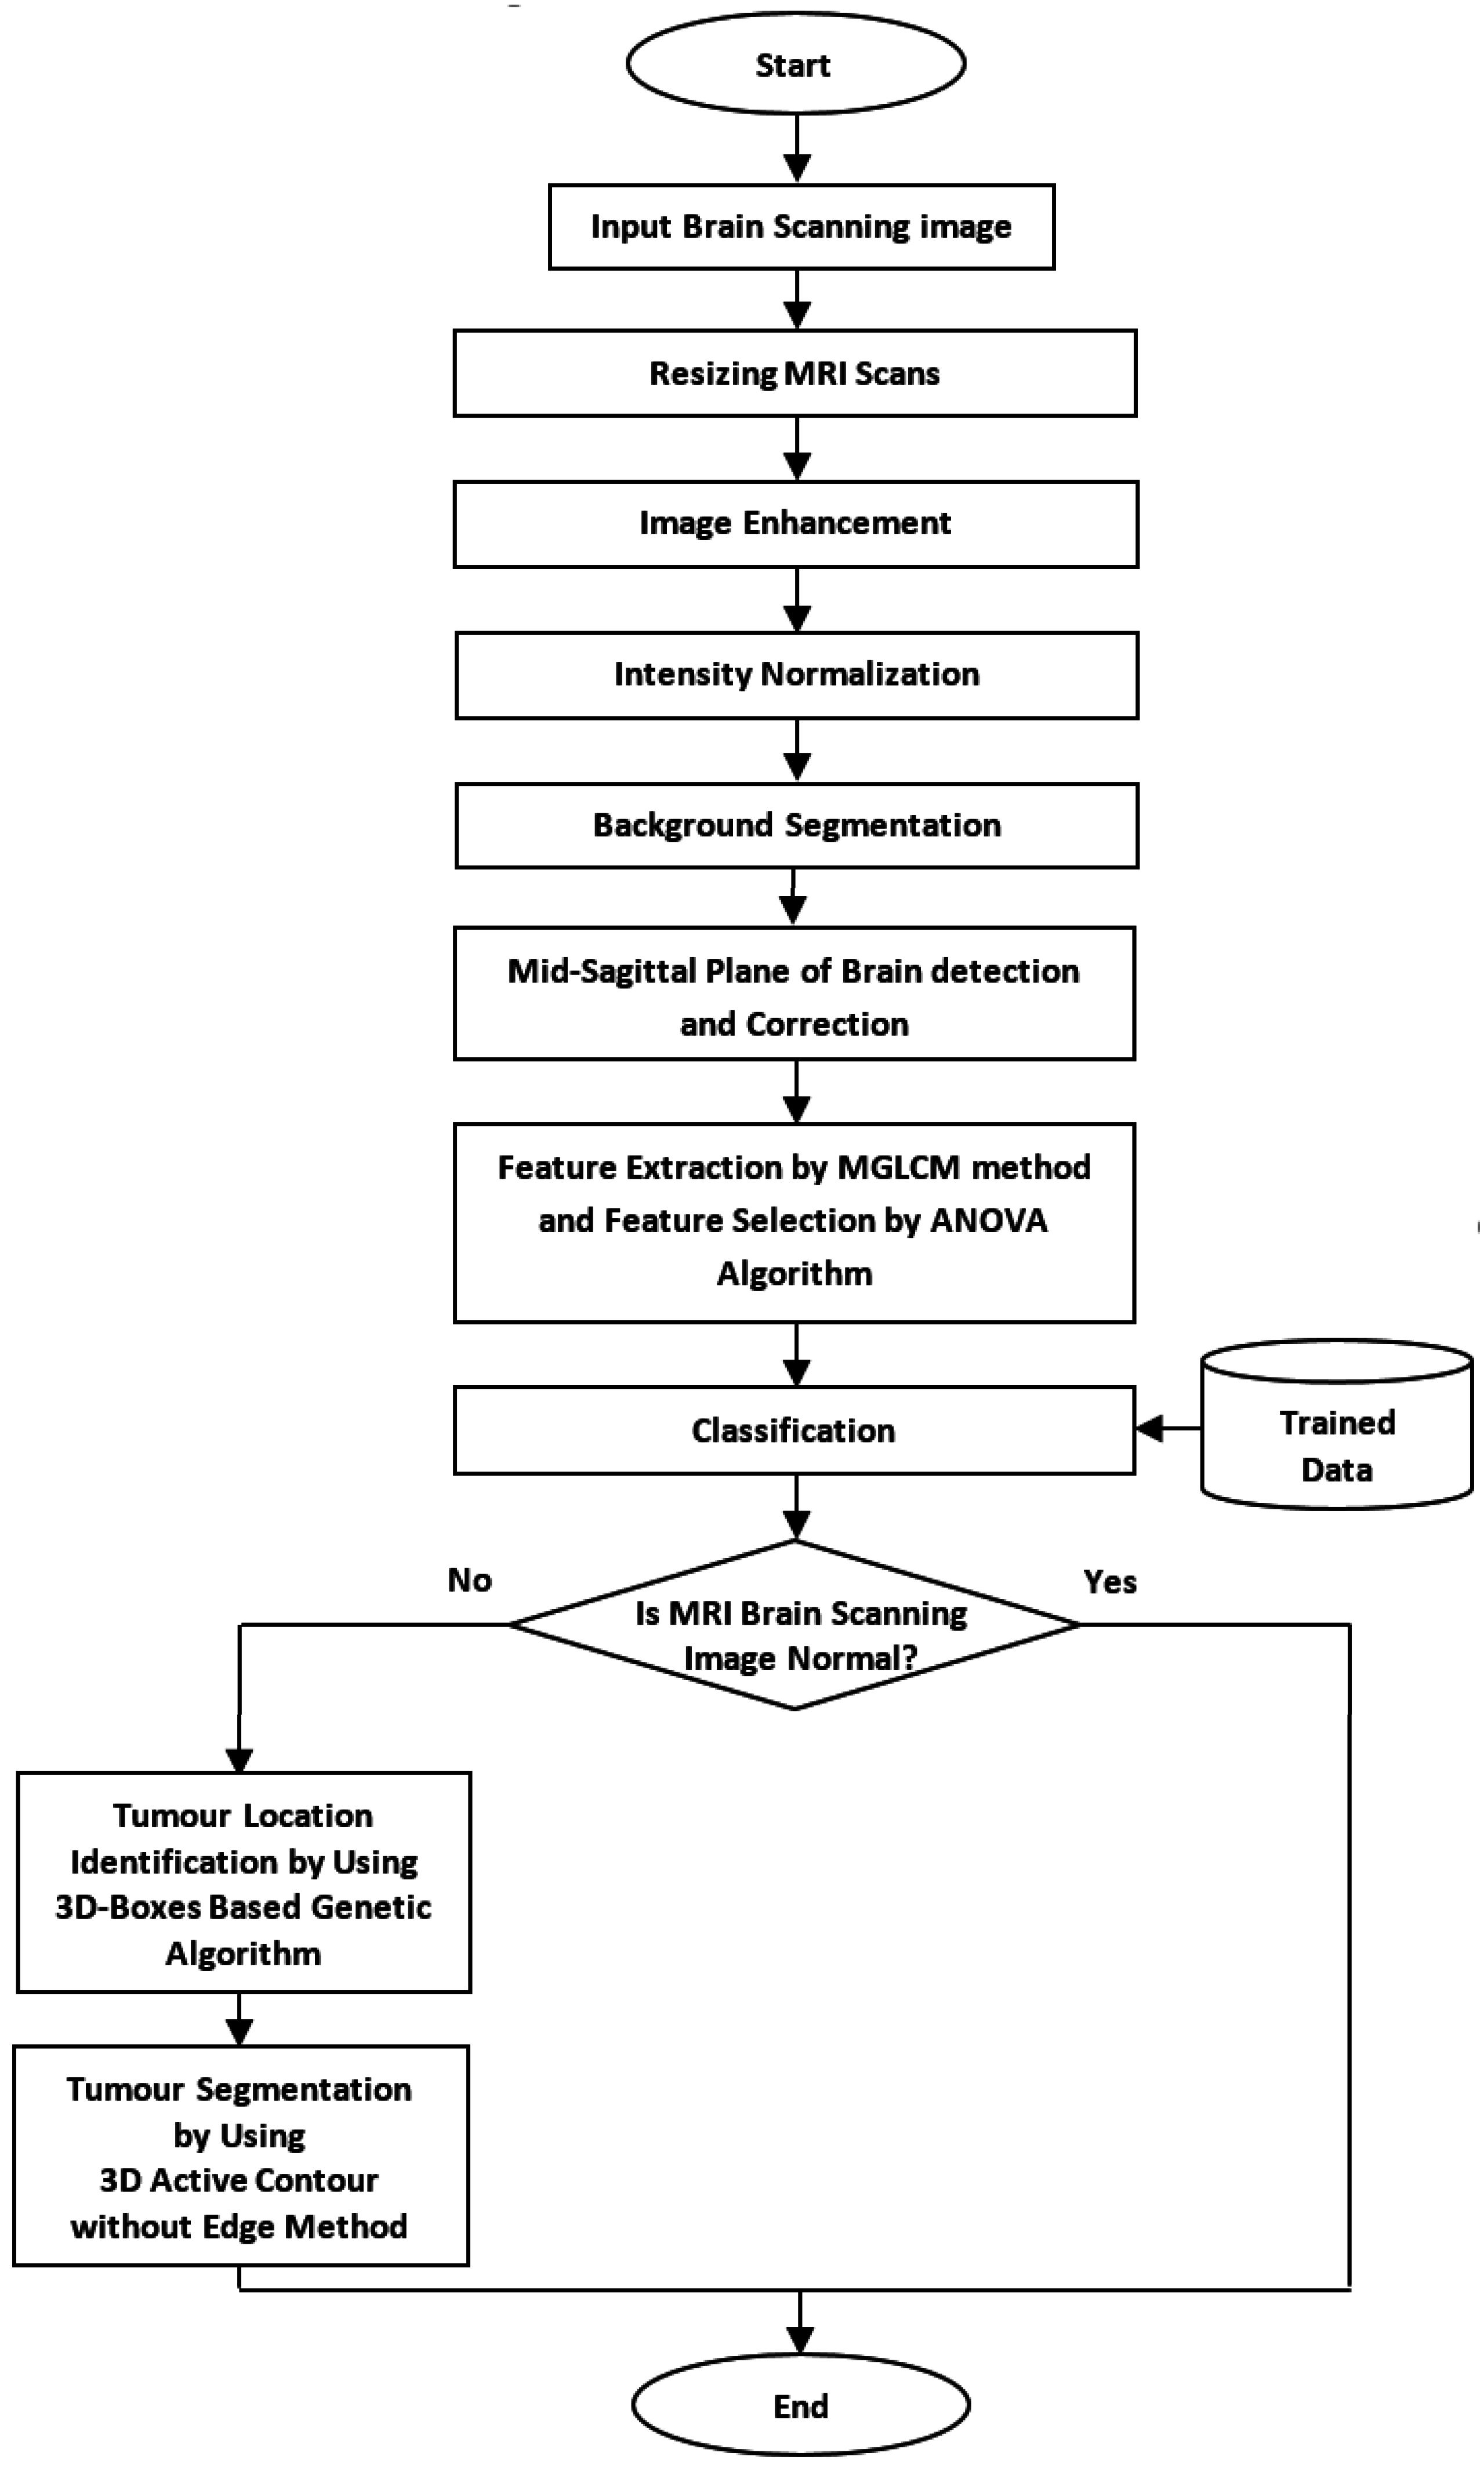 Symmetry | Free Full-Text | Segmentation of Brain Tumors in MRI